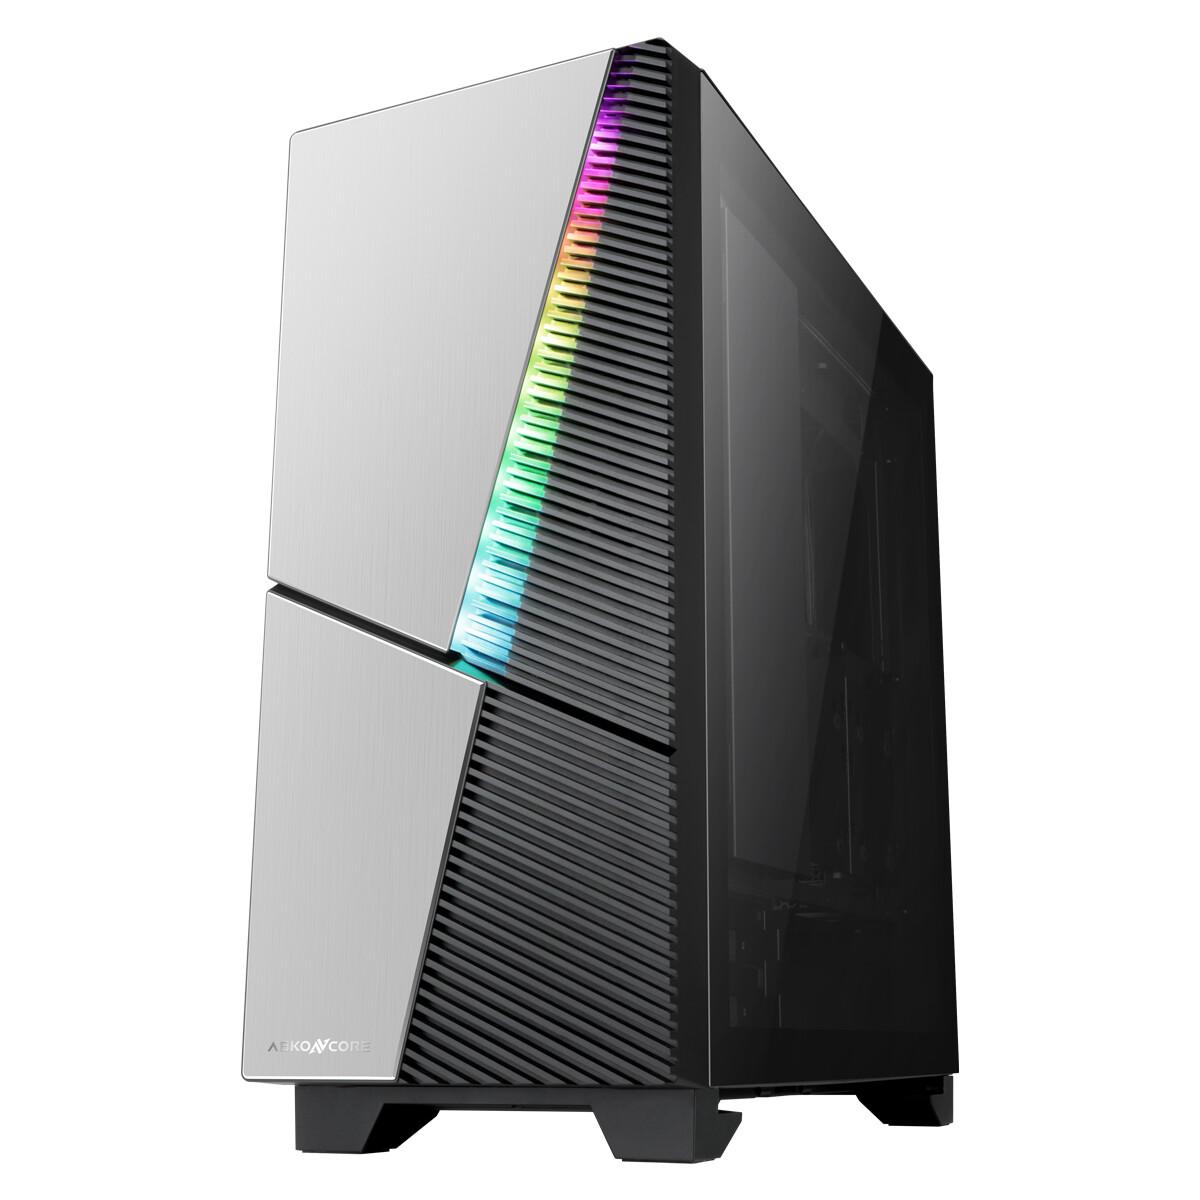 Компьютерный корпус Abkoncore AL700 Sync весит 13,6 кг